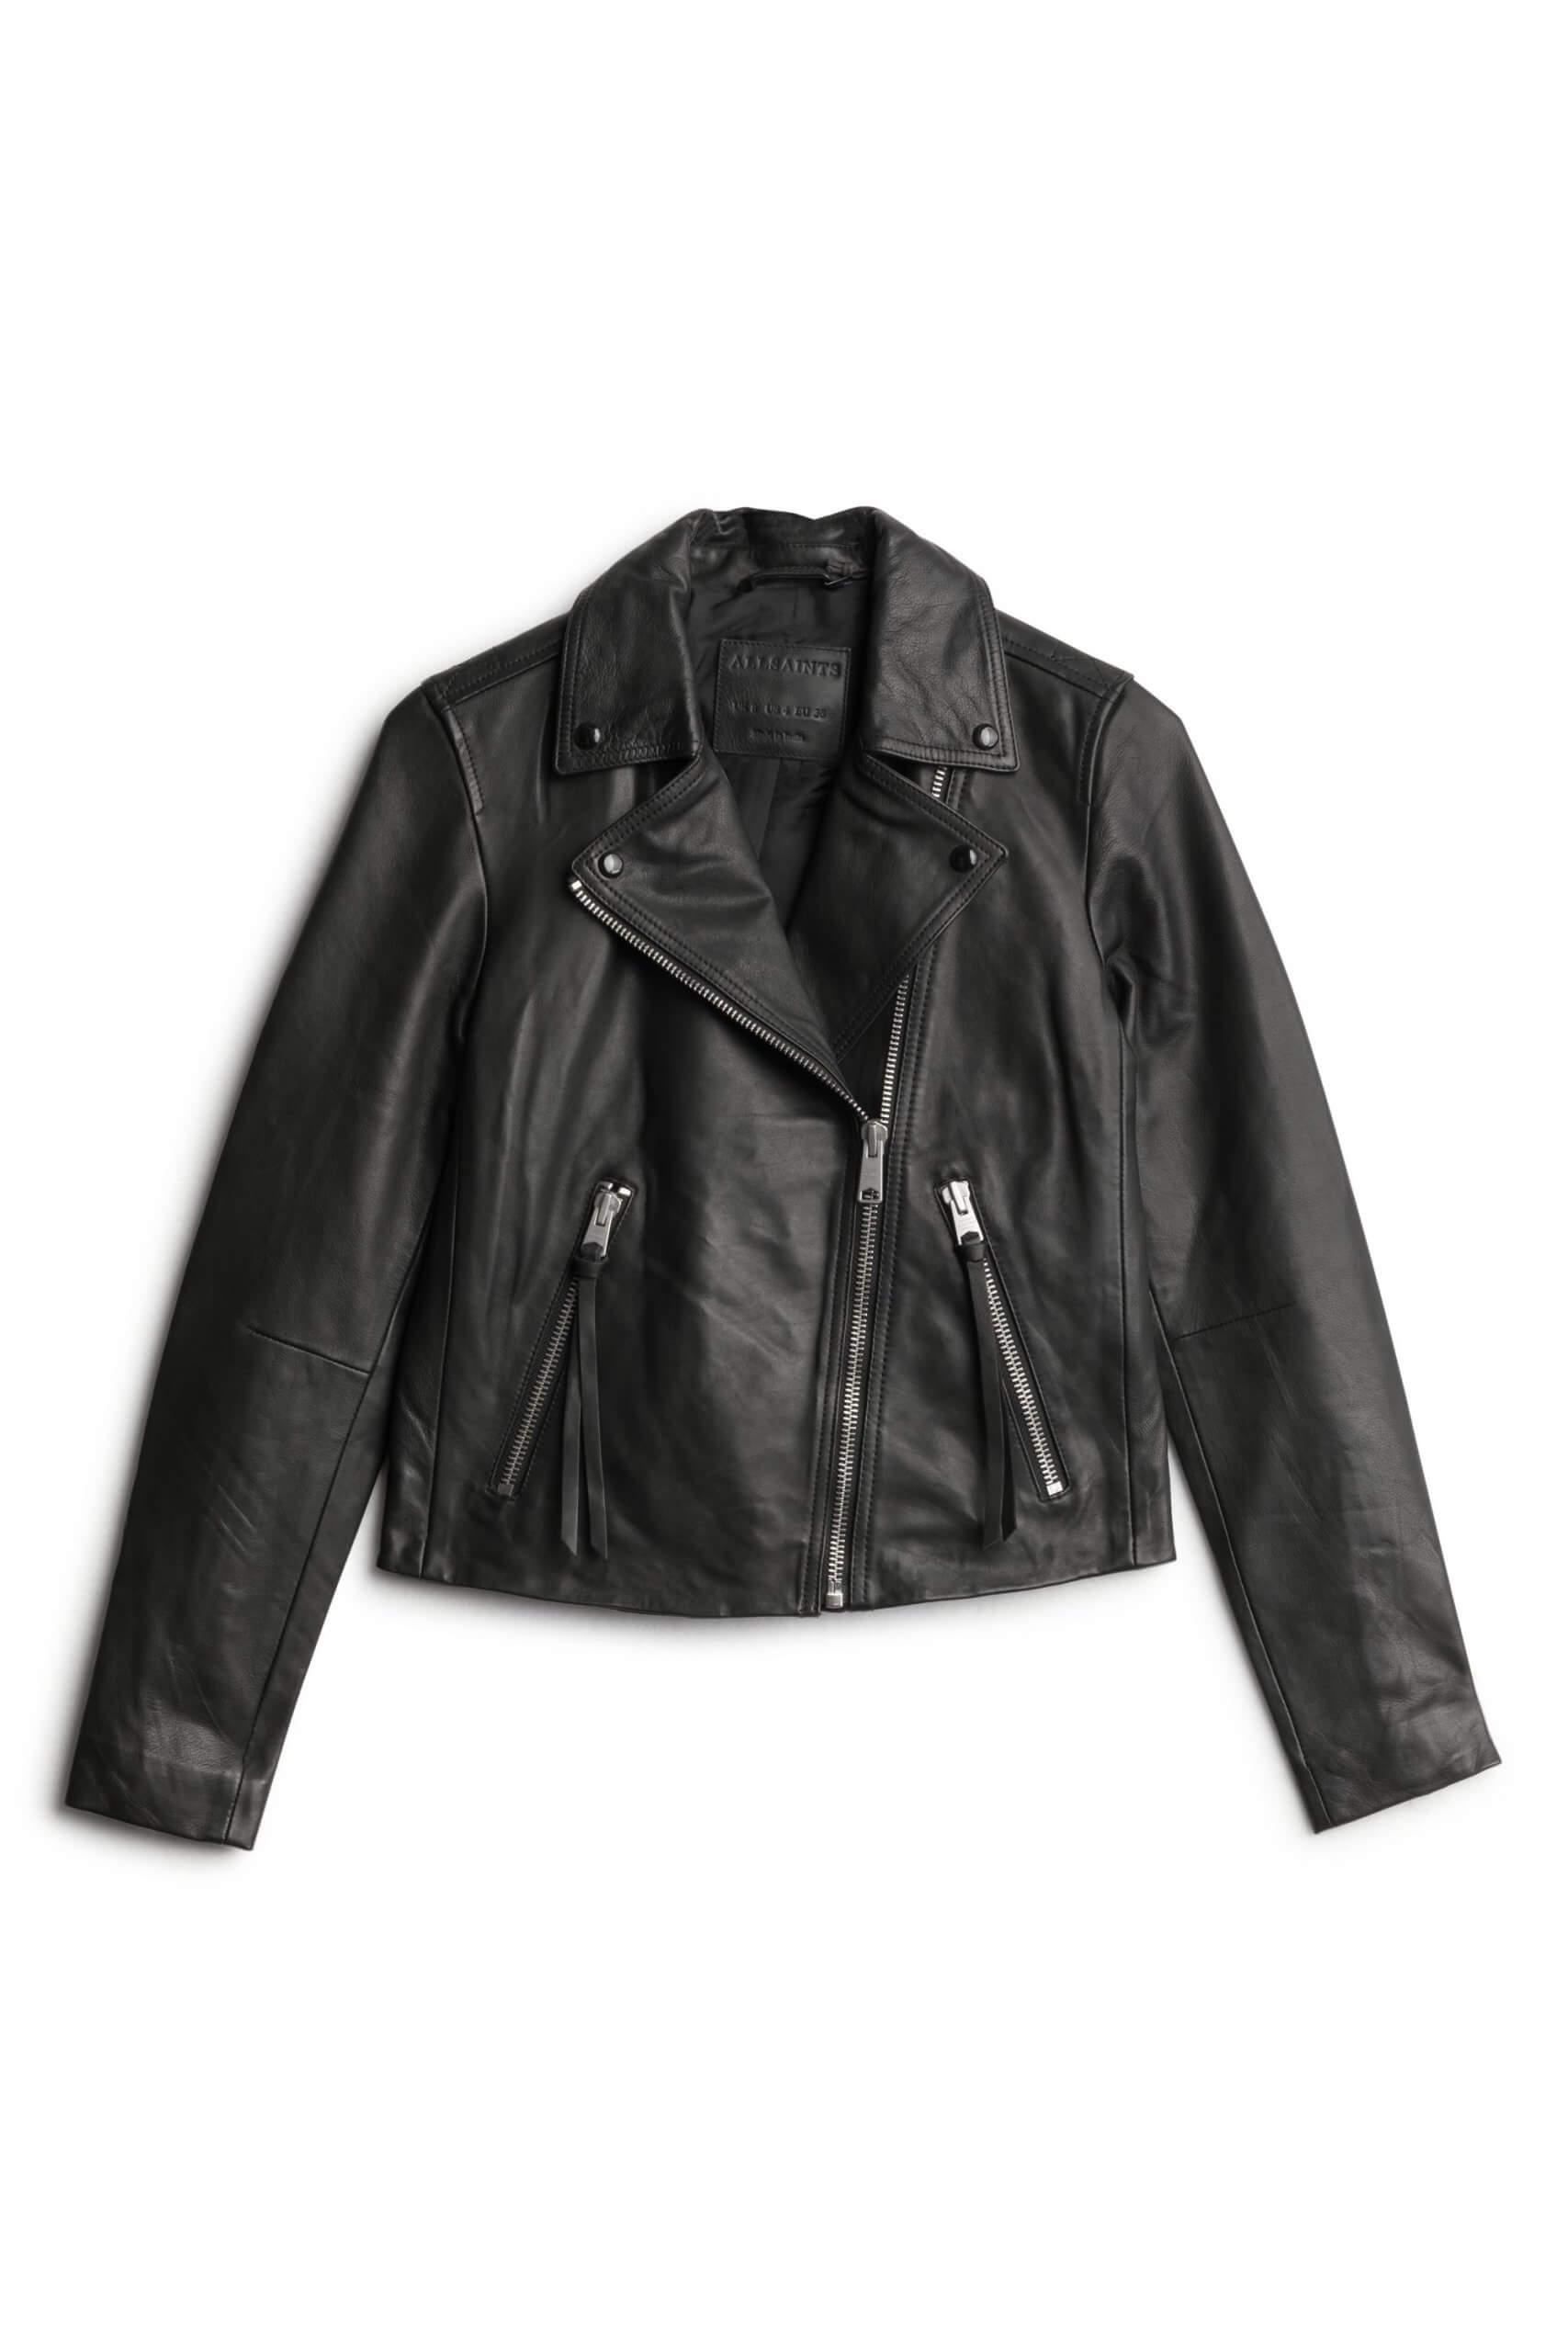 Stitch Fix Women's black moto jacket.